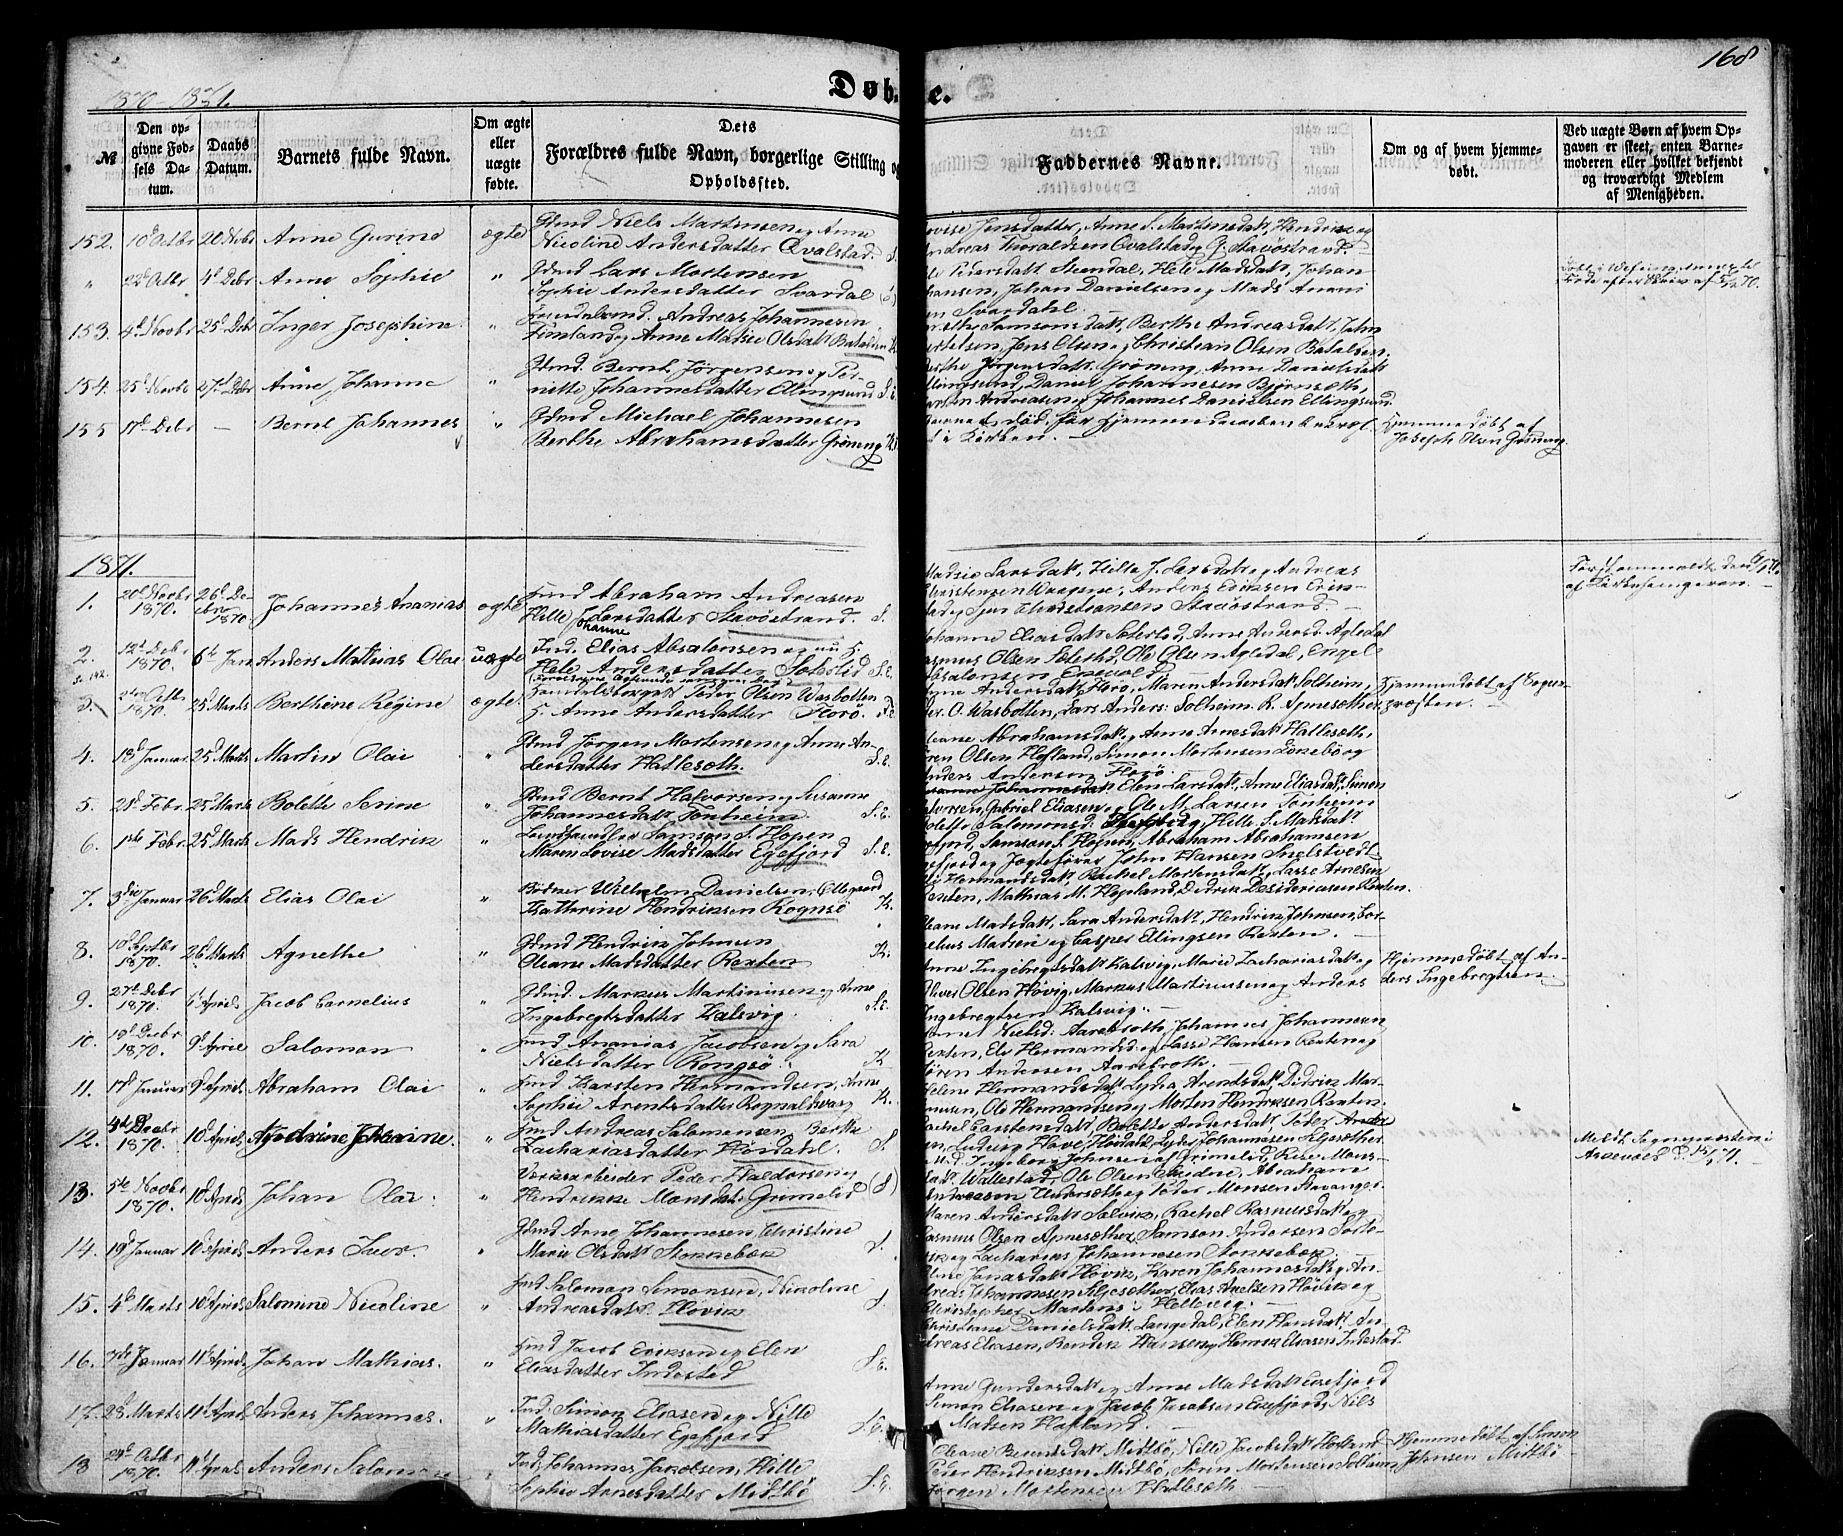 SAB, Kinn sokneprestembete, H/Haa/Haaa/L0006: Parish register (official) no. A 6, 1857-1885, p. 168